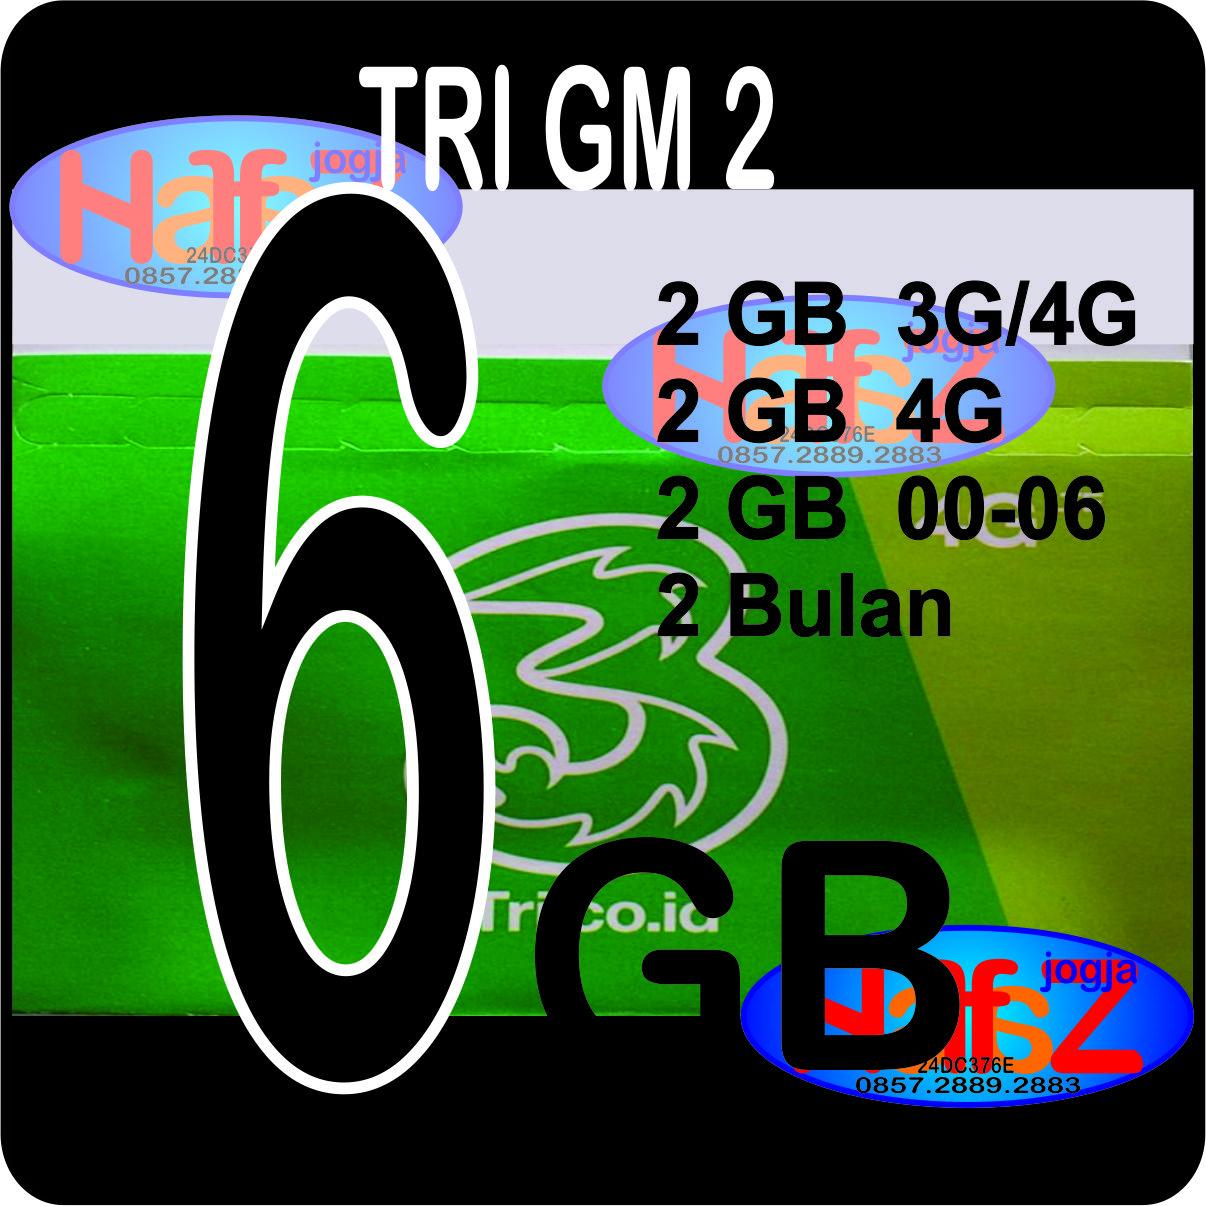 Halfaz Jogja Axis Kartu Perdana Irit Des2015 Upgrade 3g Ke 4g Tri Gm 2 2017